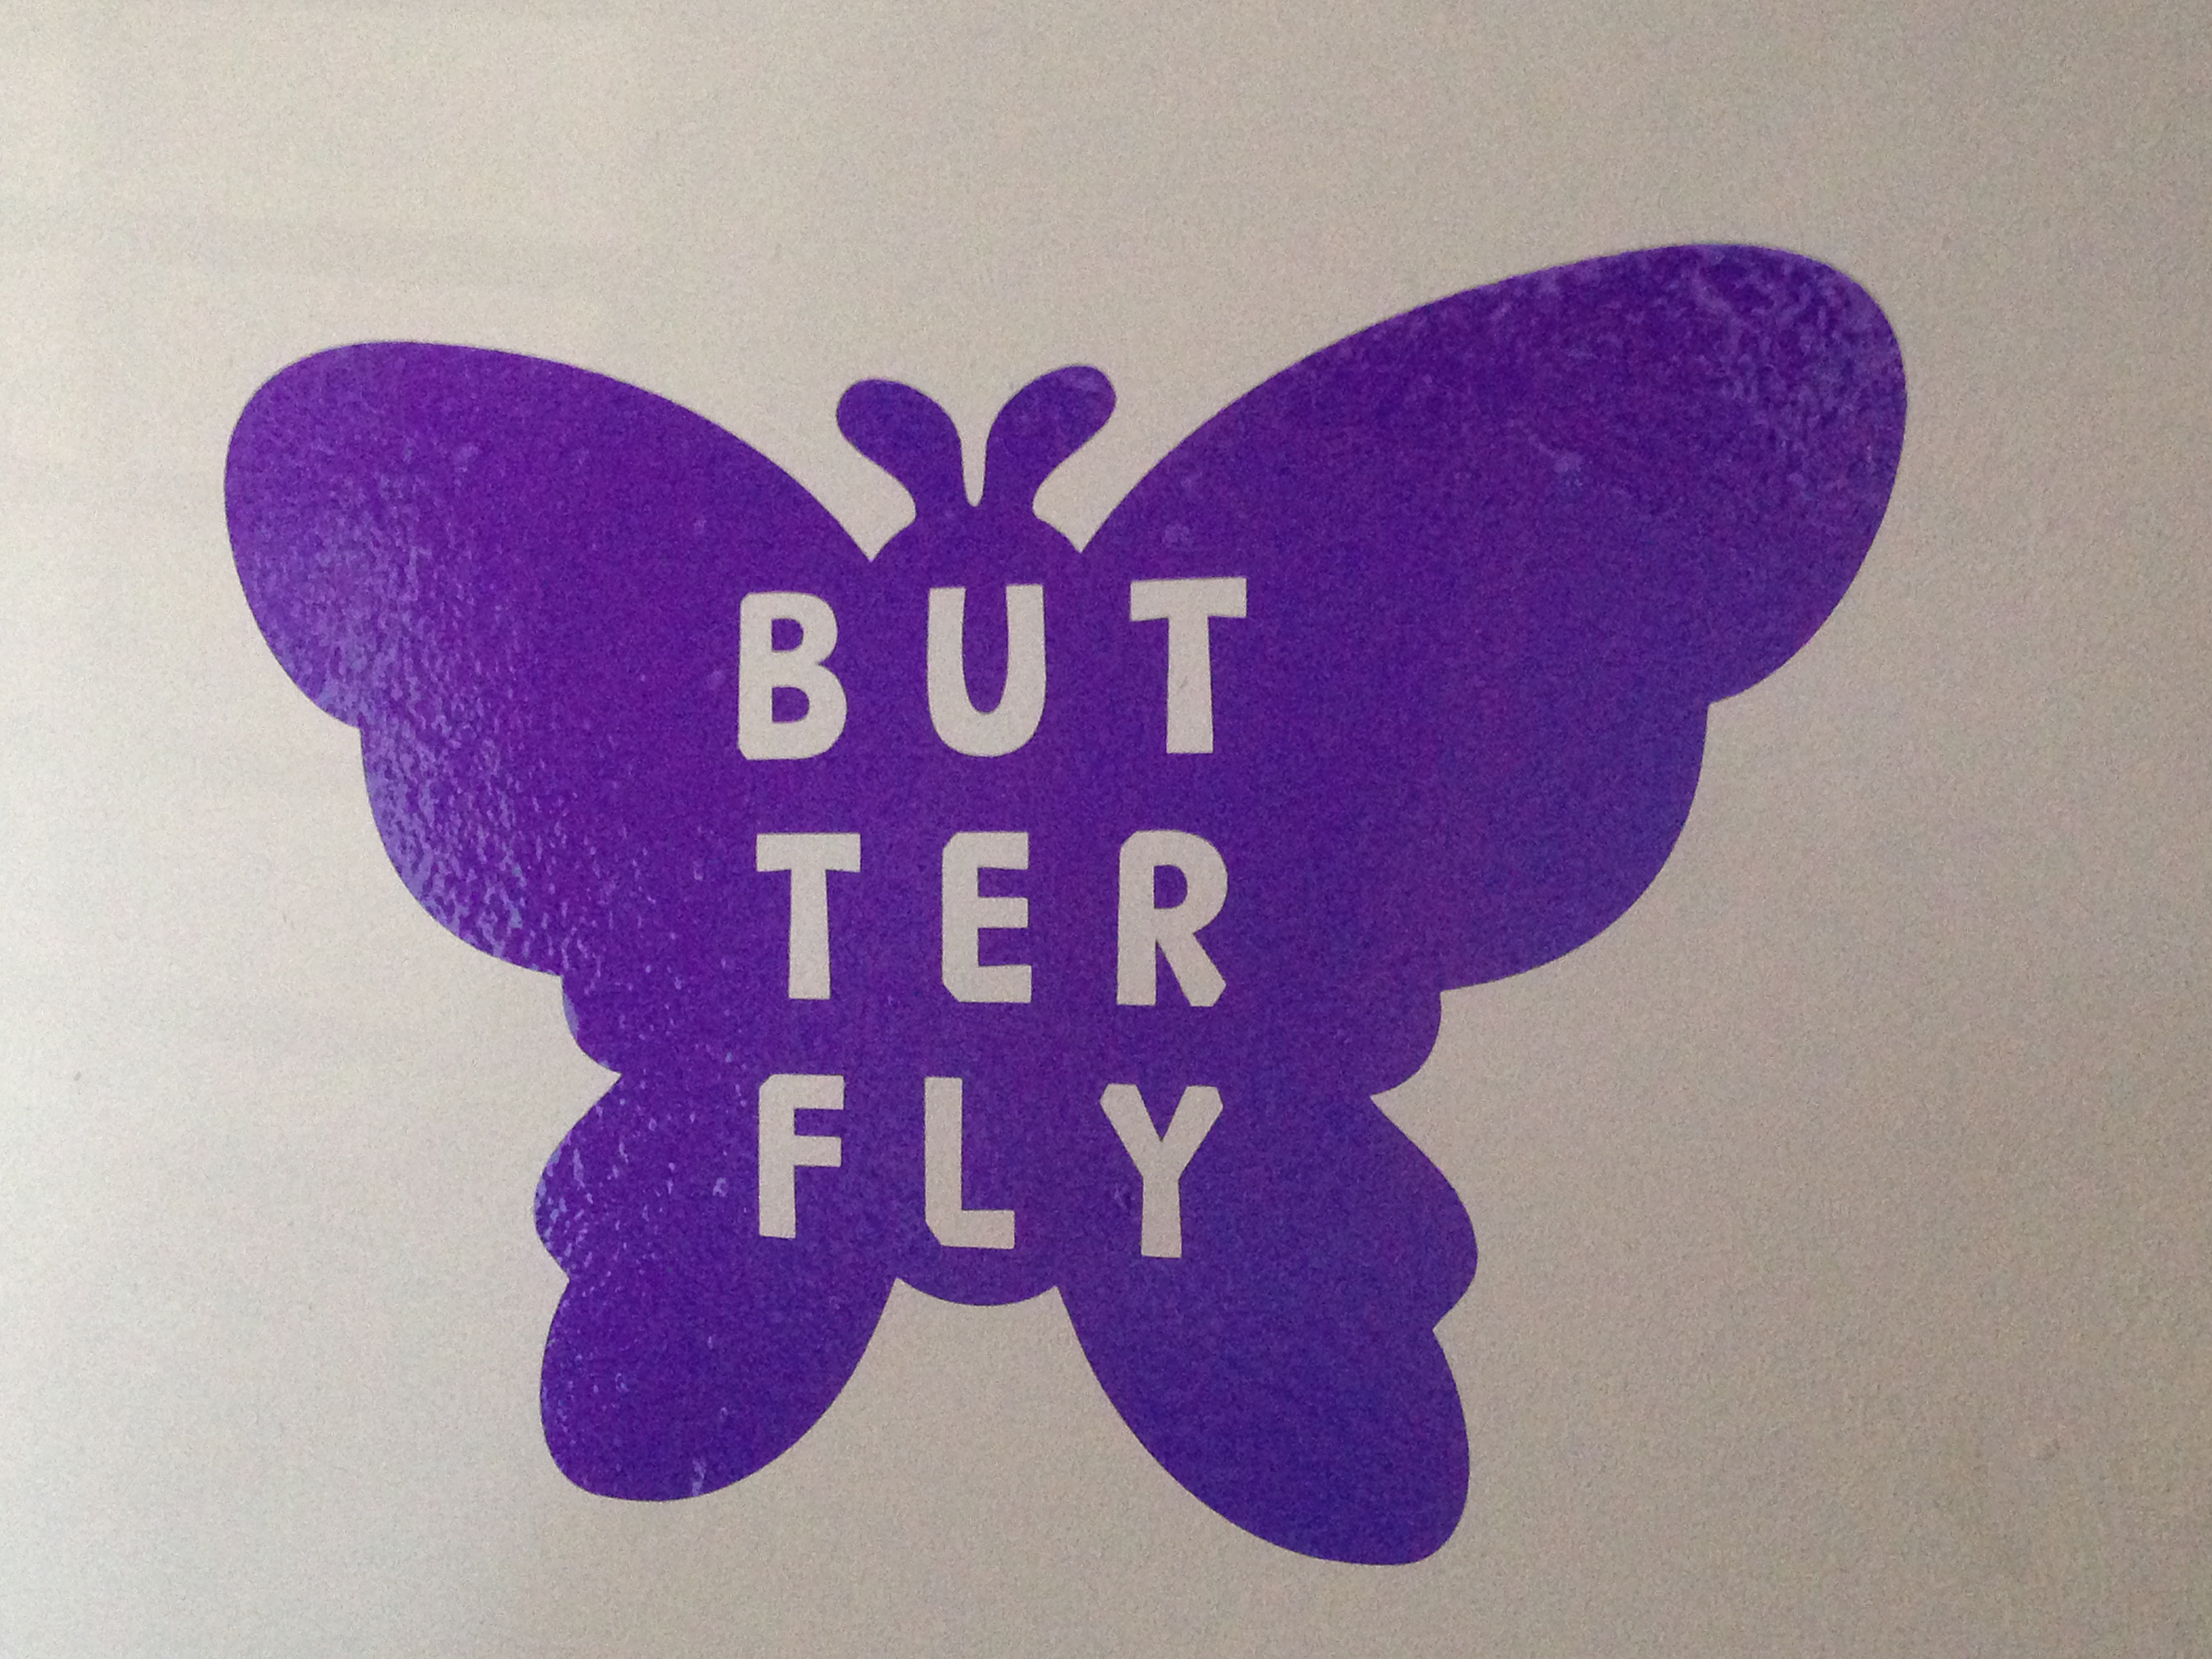 Butterfly vinyl image